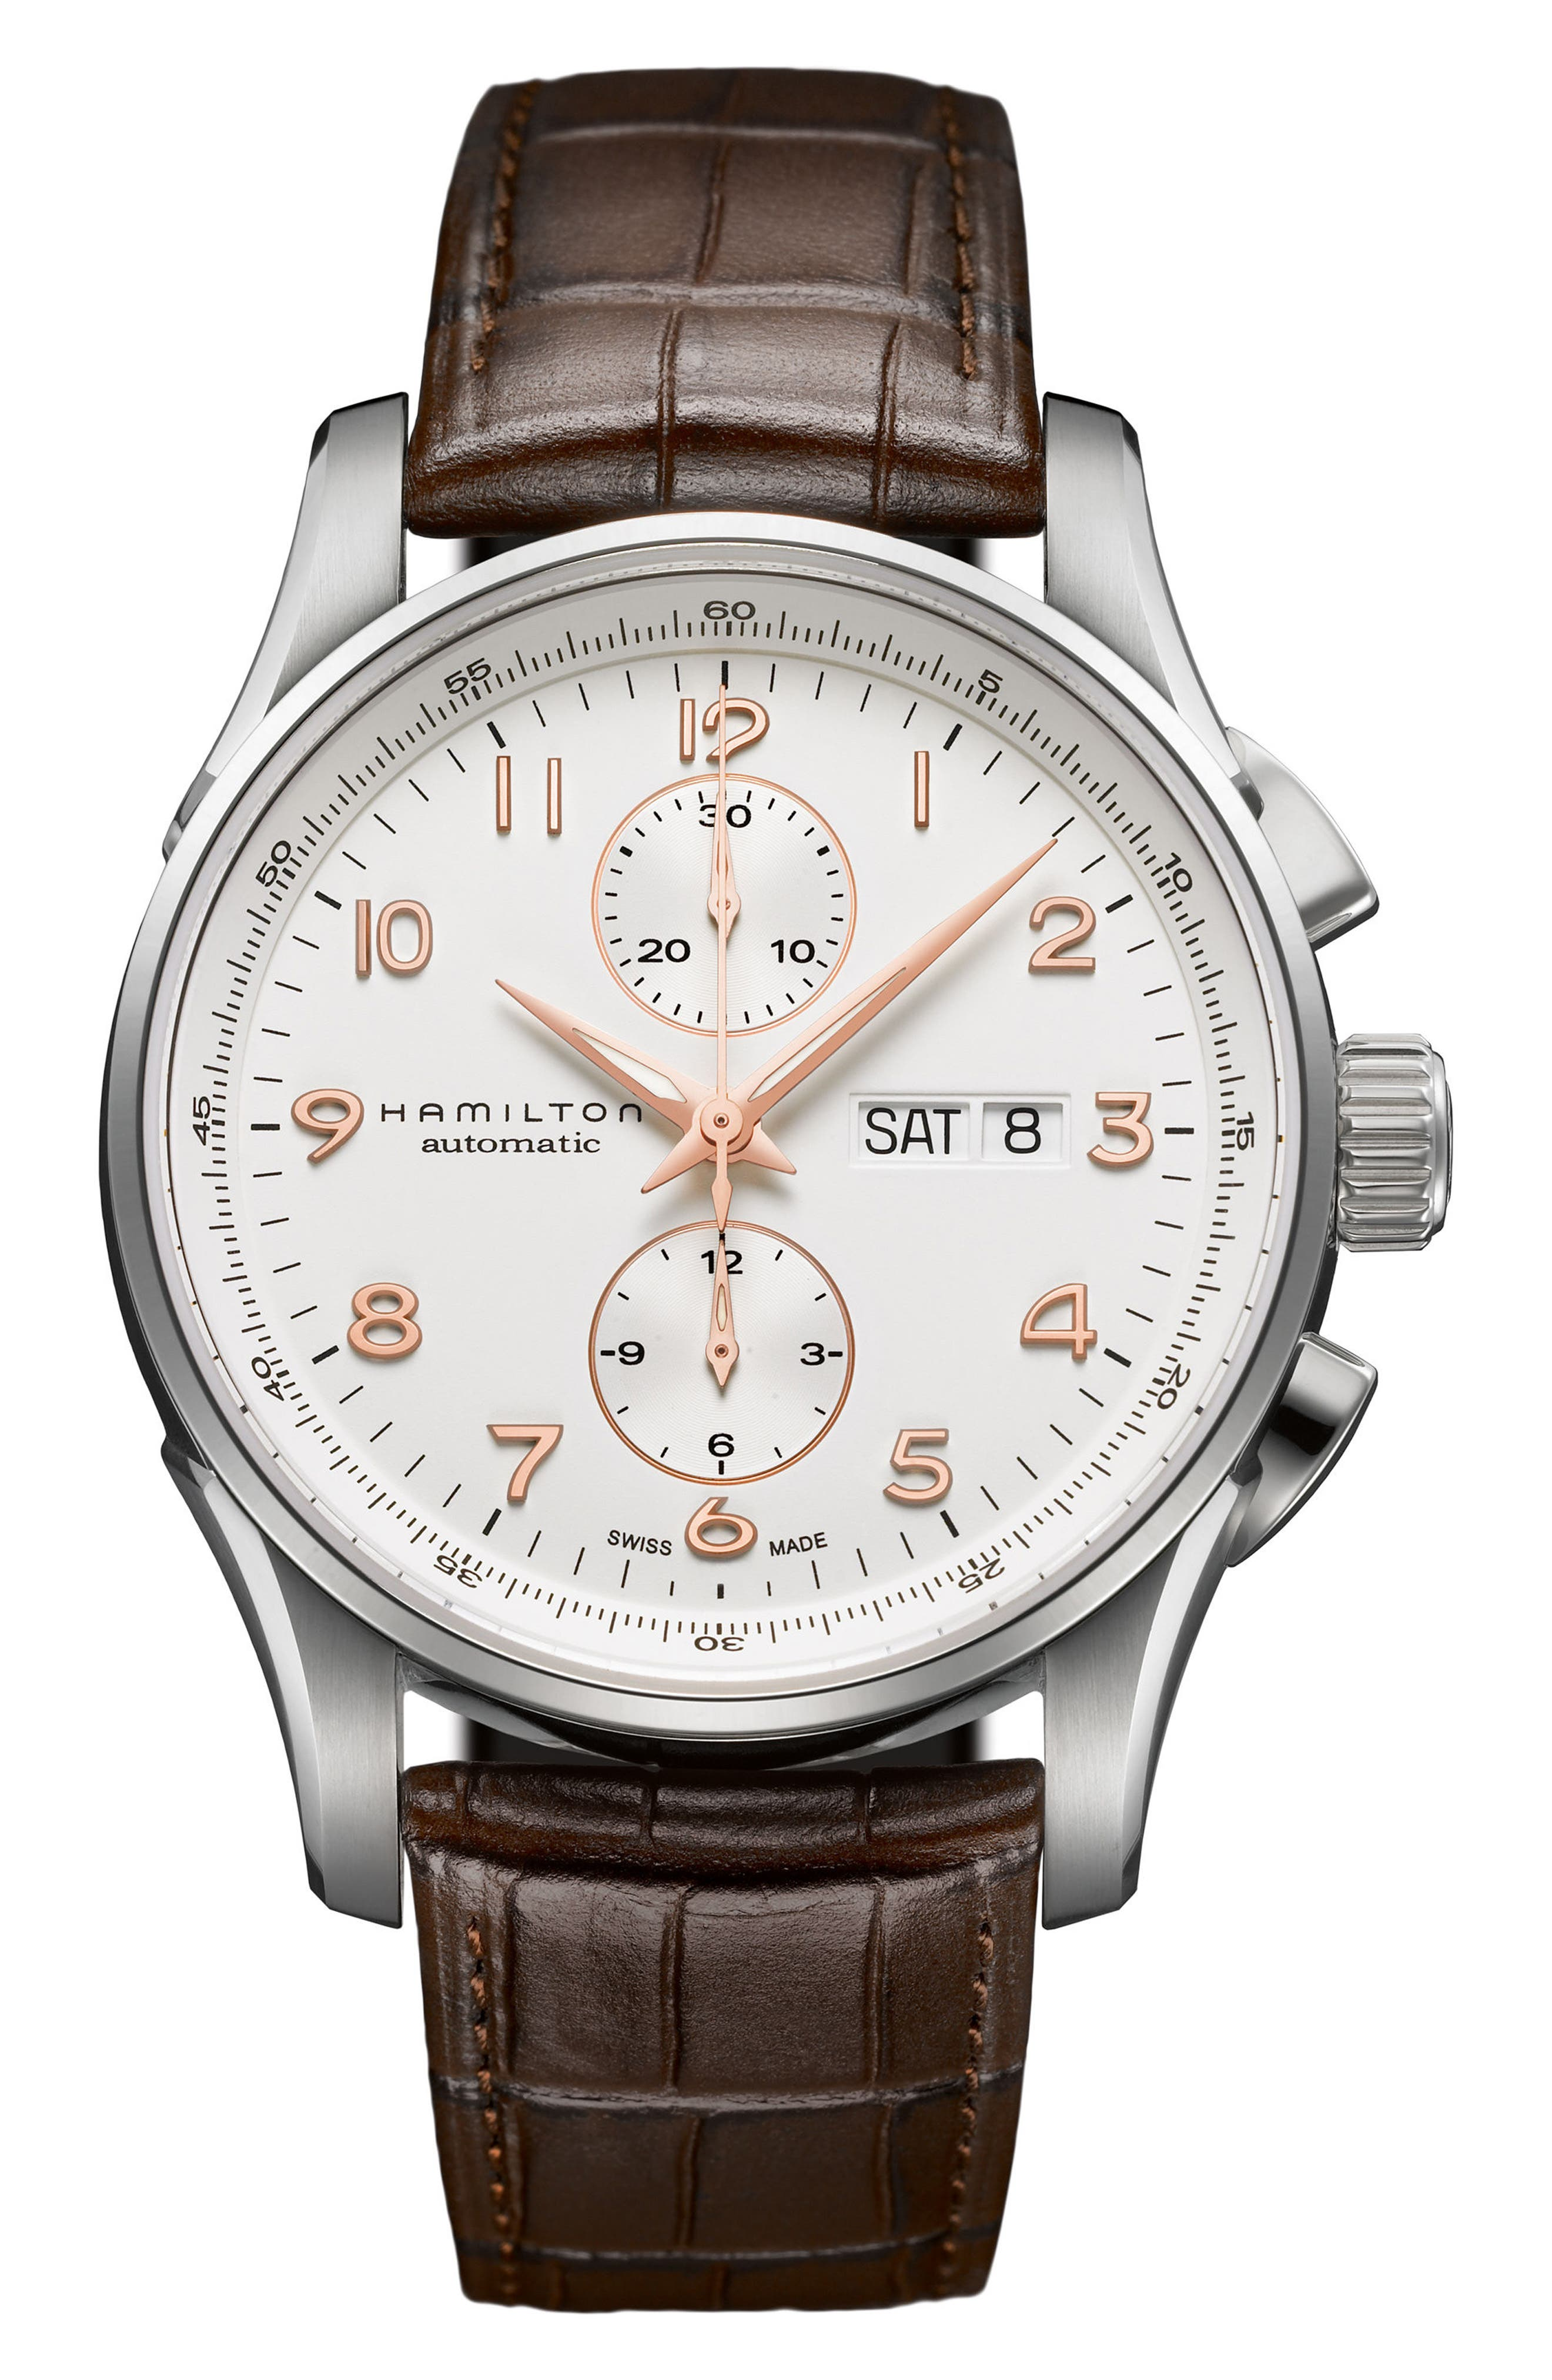 Main Image - Hamilton Jazzmaster Maestro Automatic Chronograph Leather Strap Watch, 41mm